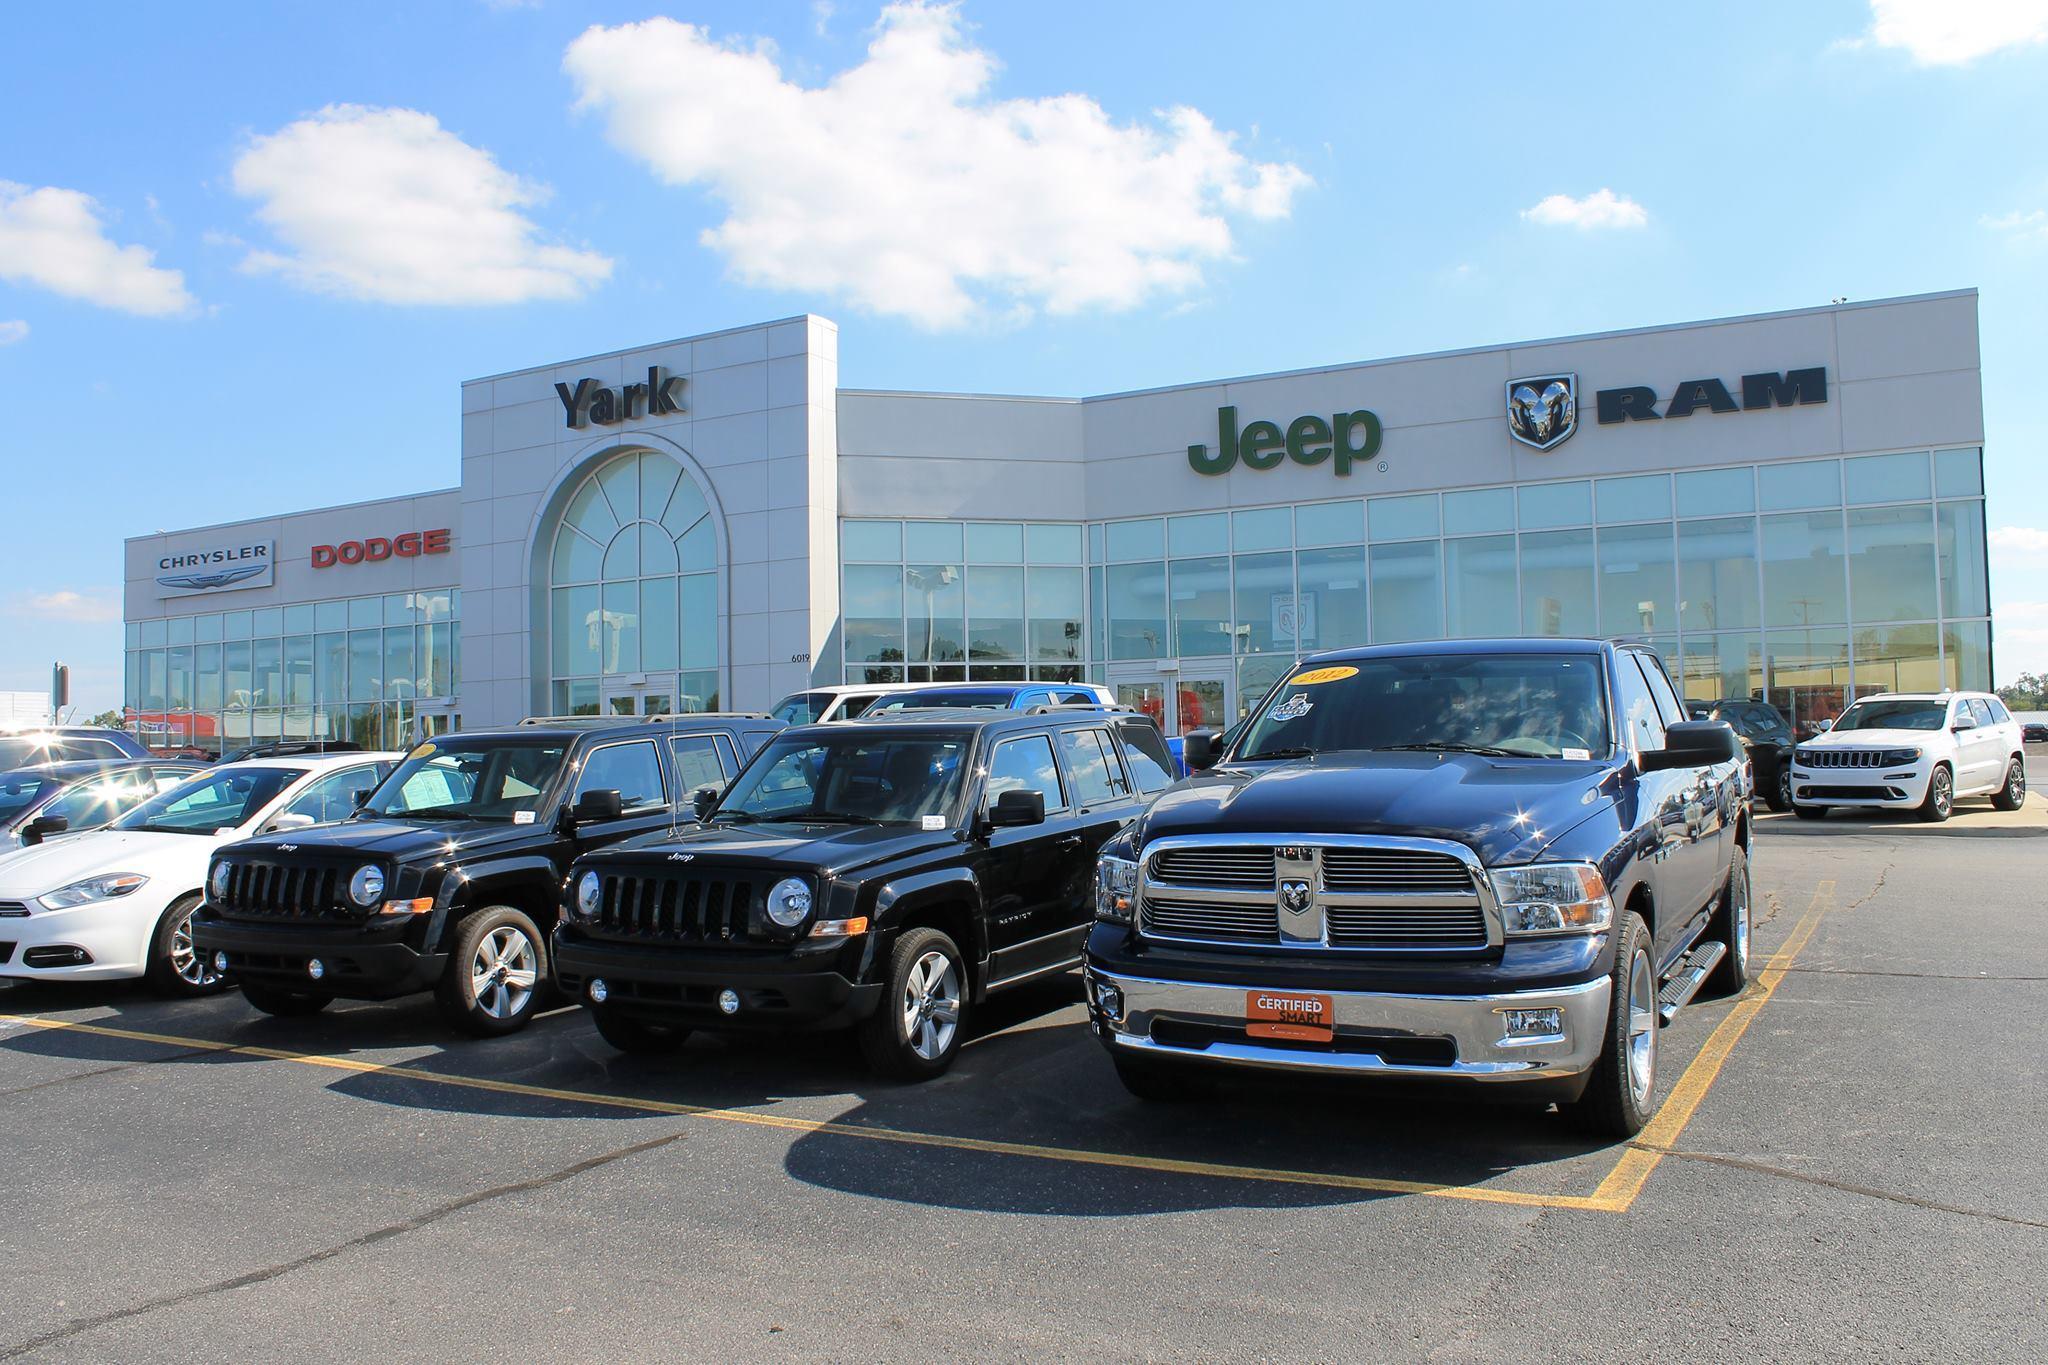 Yark Chrysler Jeep Dodge Ram 6019 West Central Avenue Toledo OH